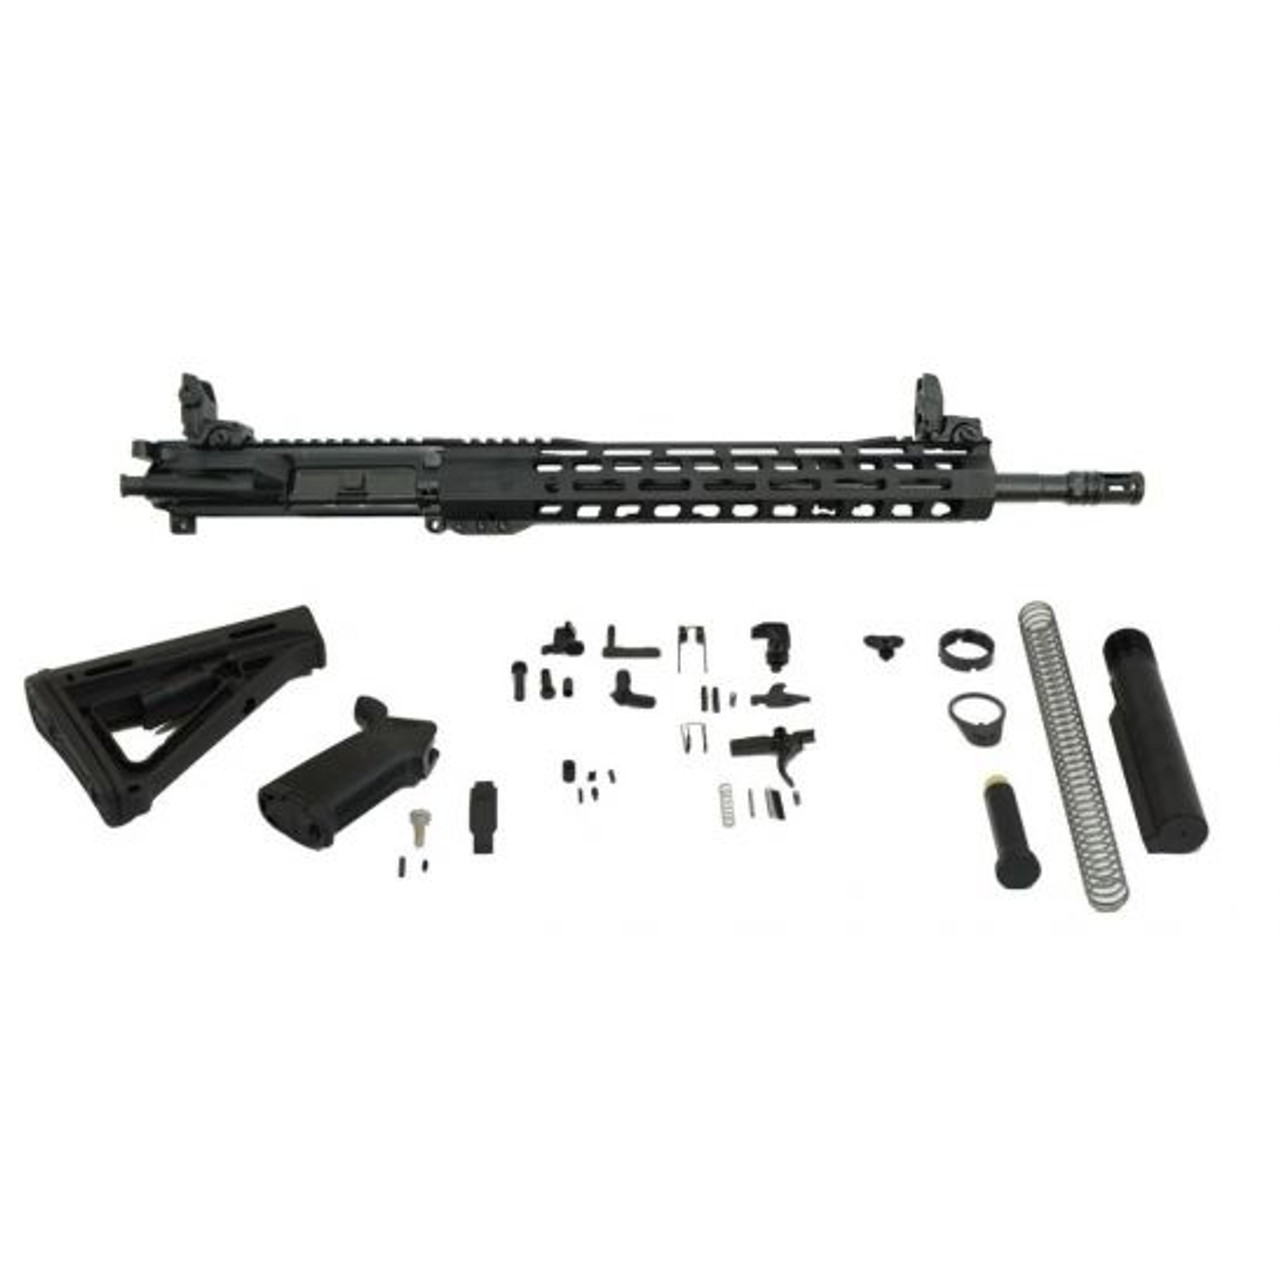 PSA Rifle Kit 16in/Carbine Lightweight Magpul MOE/EPT CALIFORNIA LEGAL - 5.56